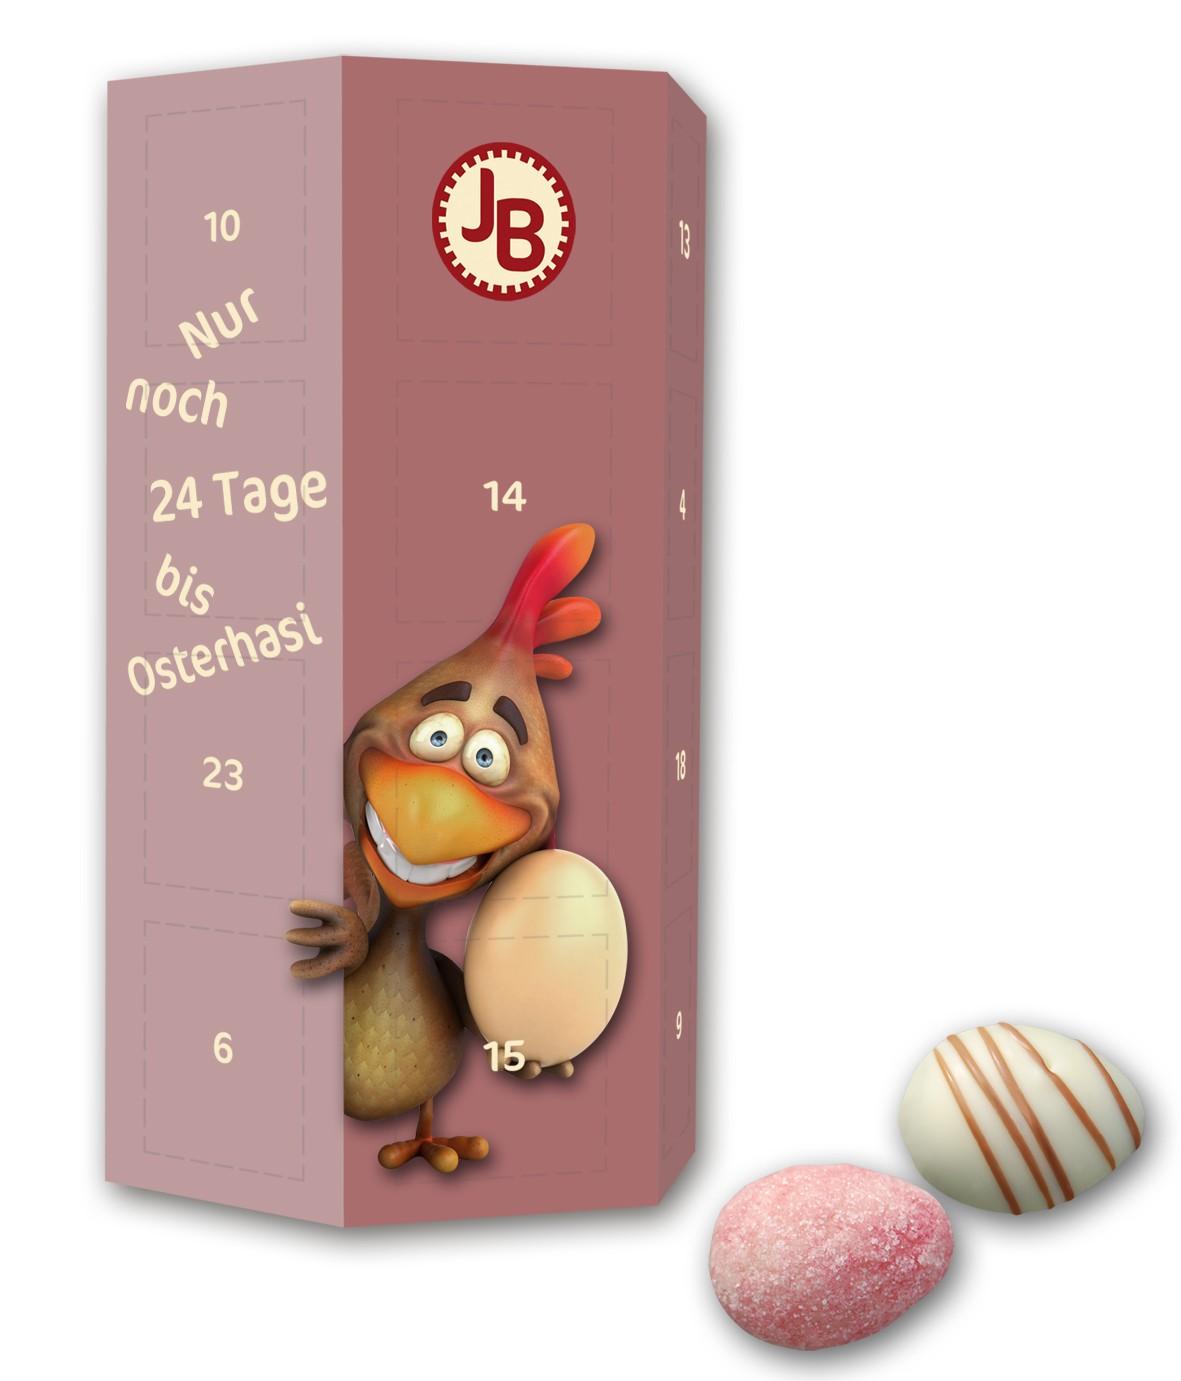 6 Eck Säulen Kalender